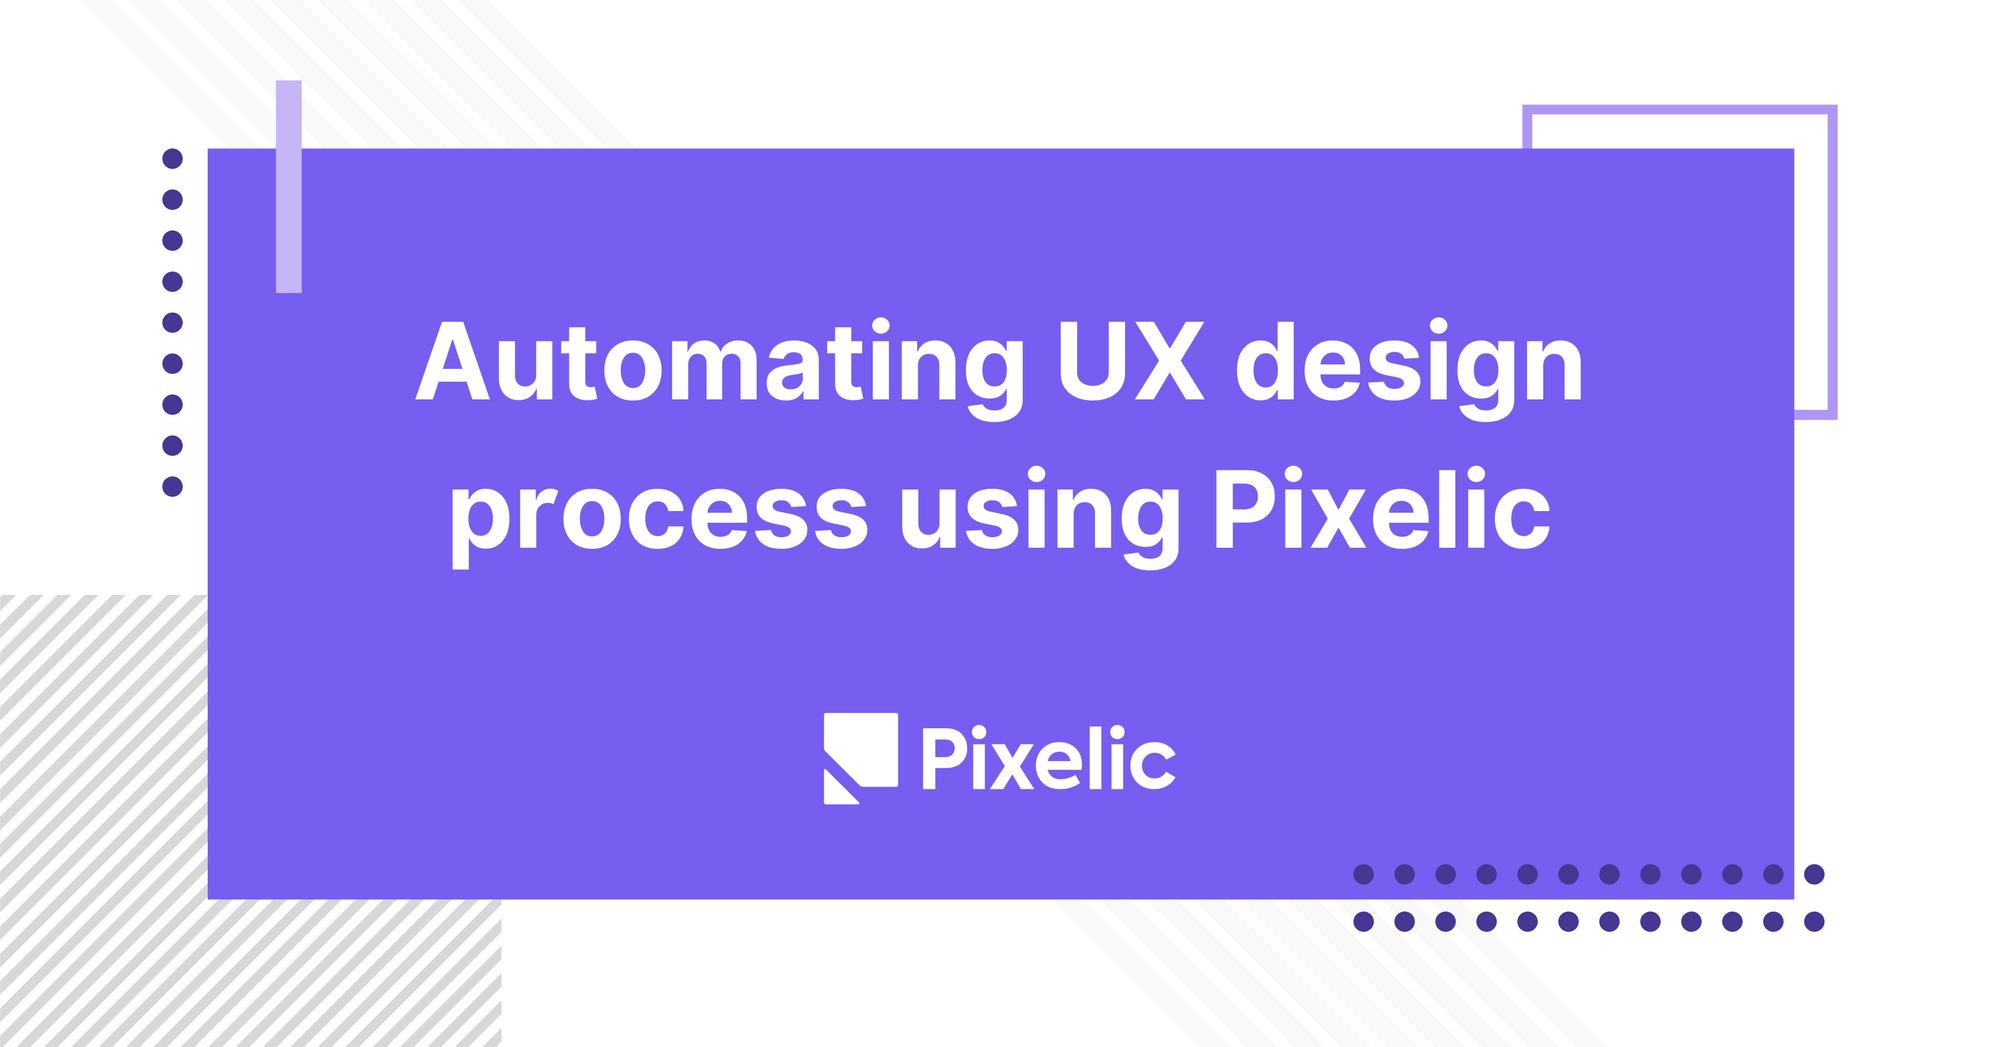 Automating UX design process using Pixelic